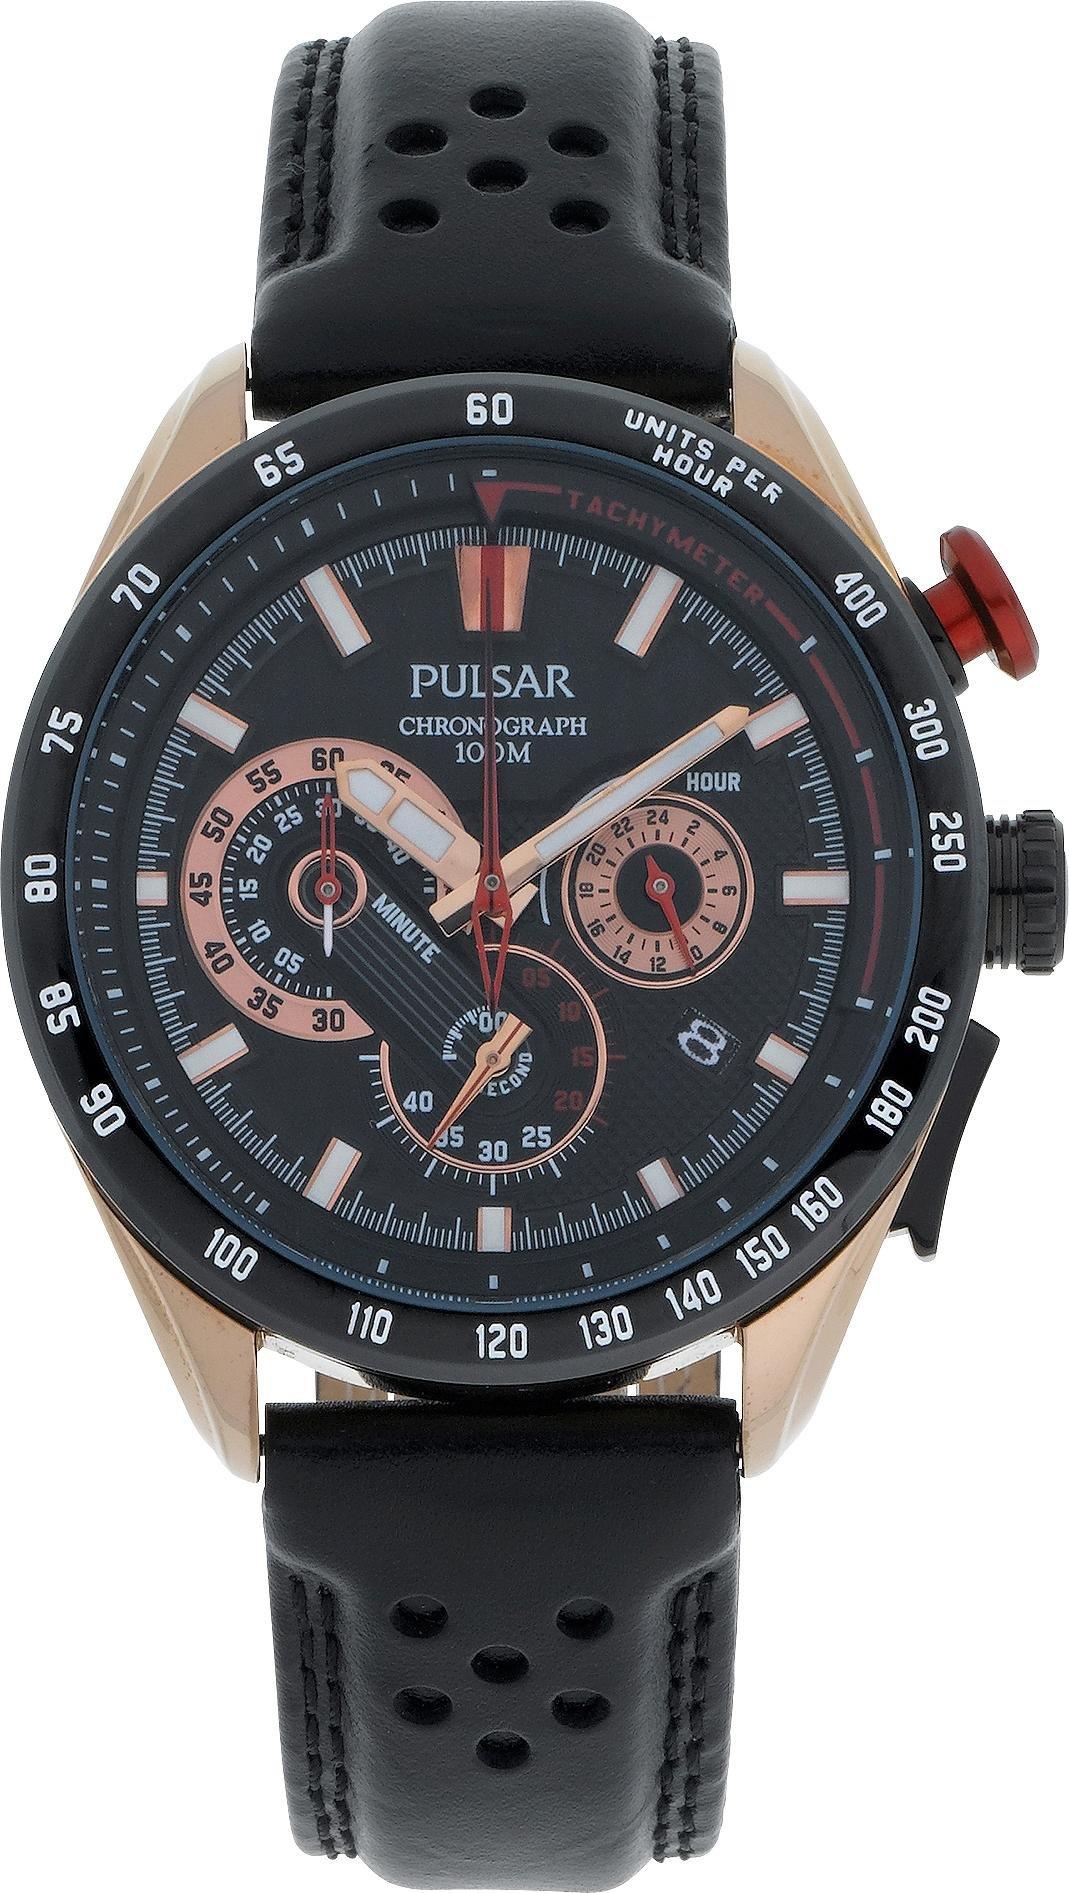 Pulsar WRC Men's Black Leather Strap Chronograph Watch